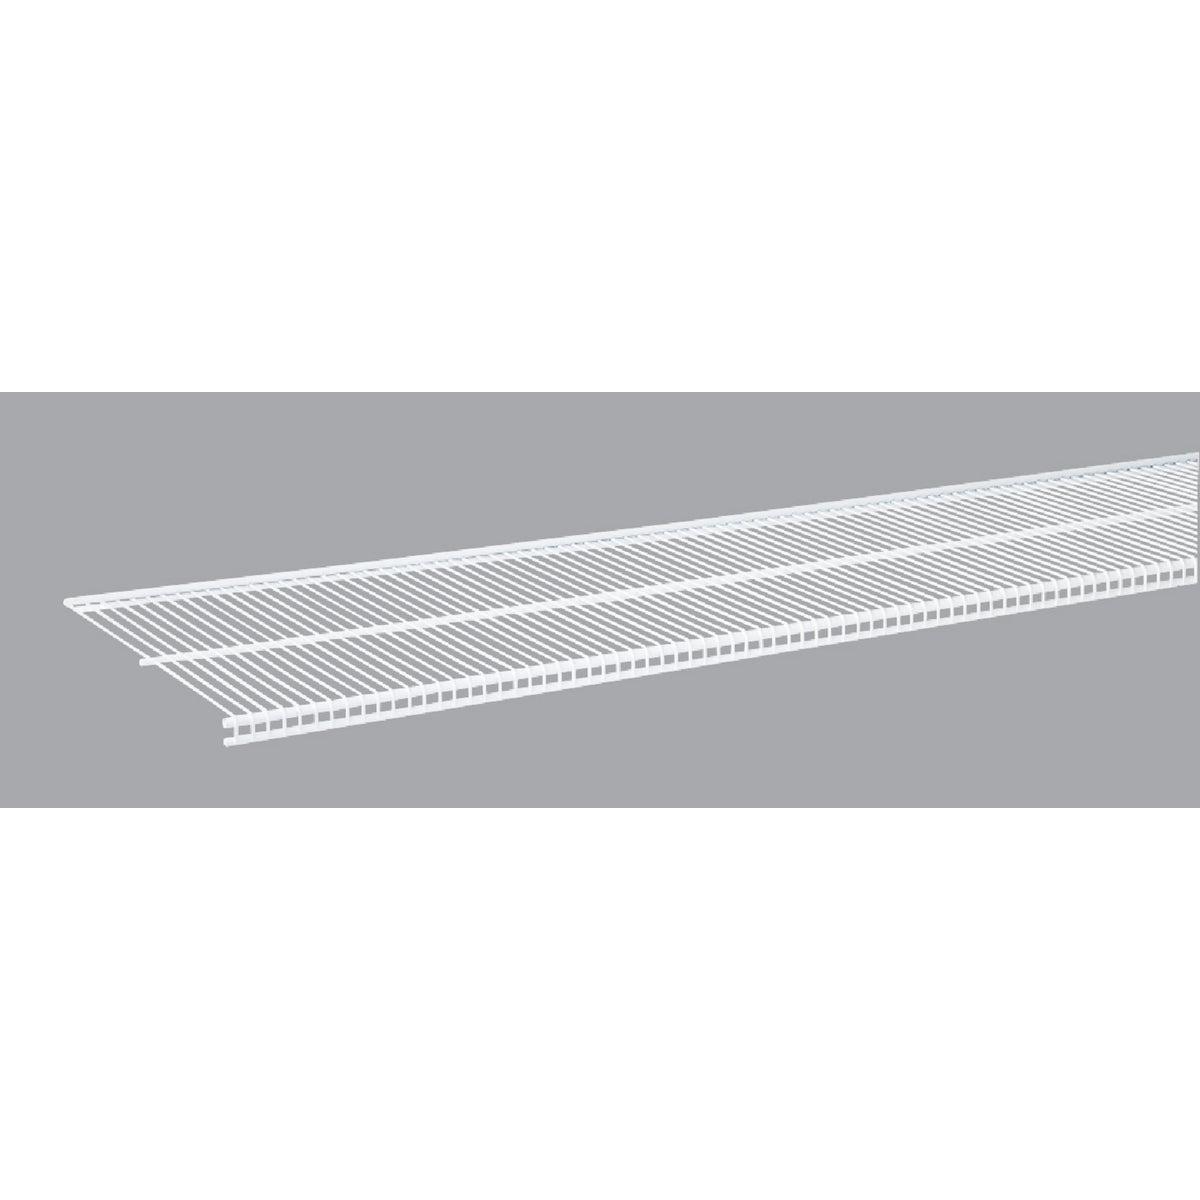 Organized Living Freedom Rail Profile Ventilated Closet Shelf (Formerly SpaceSaver Shelf), 1813124811